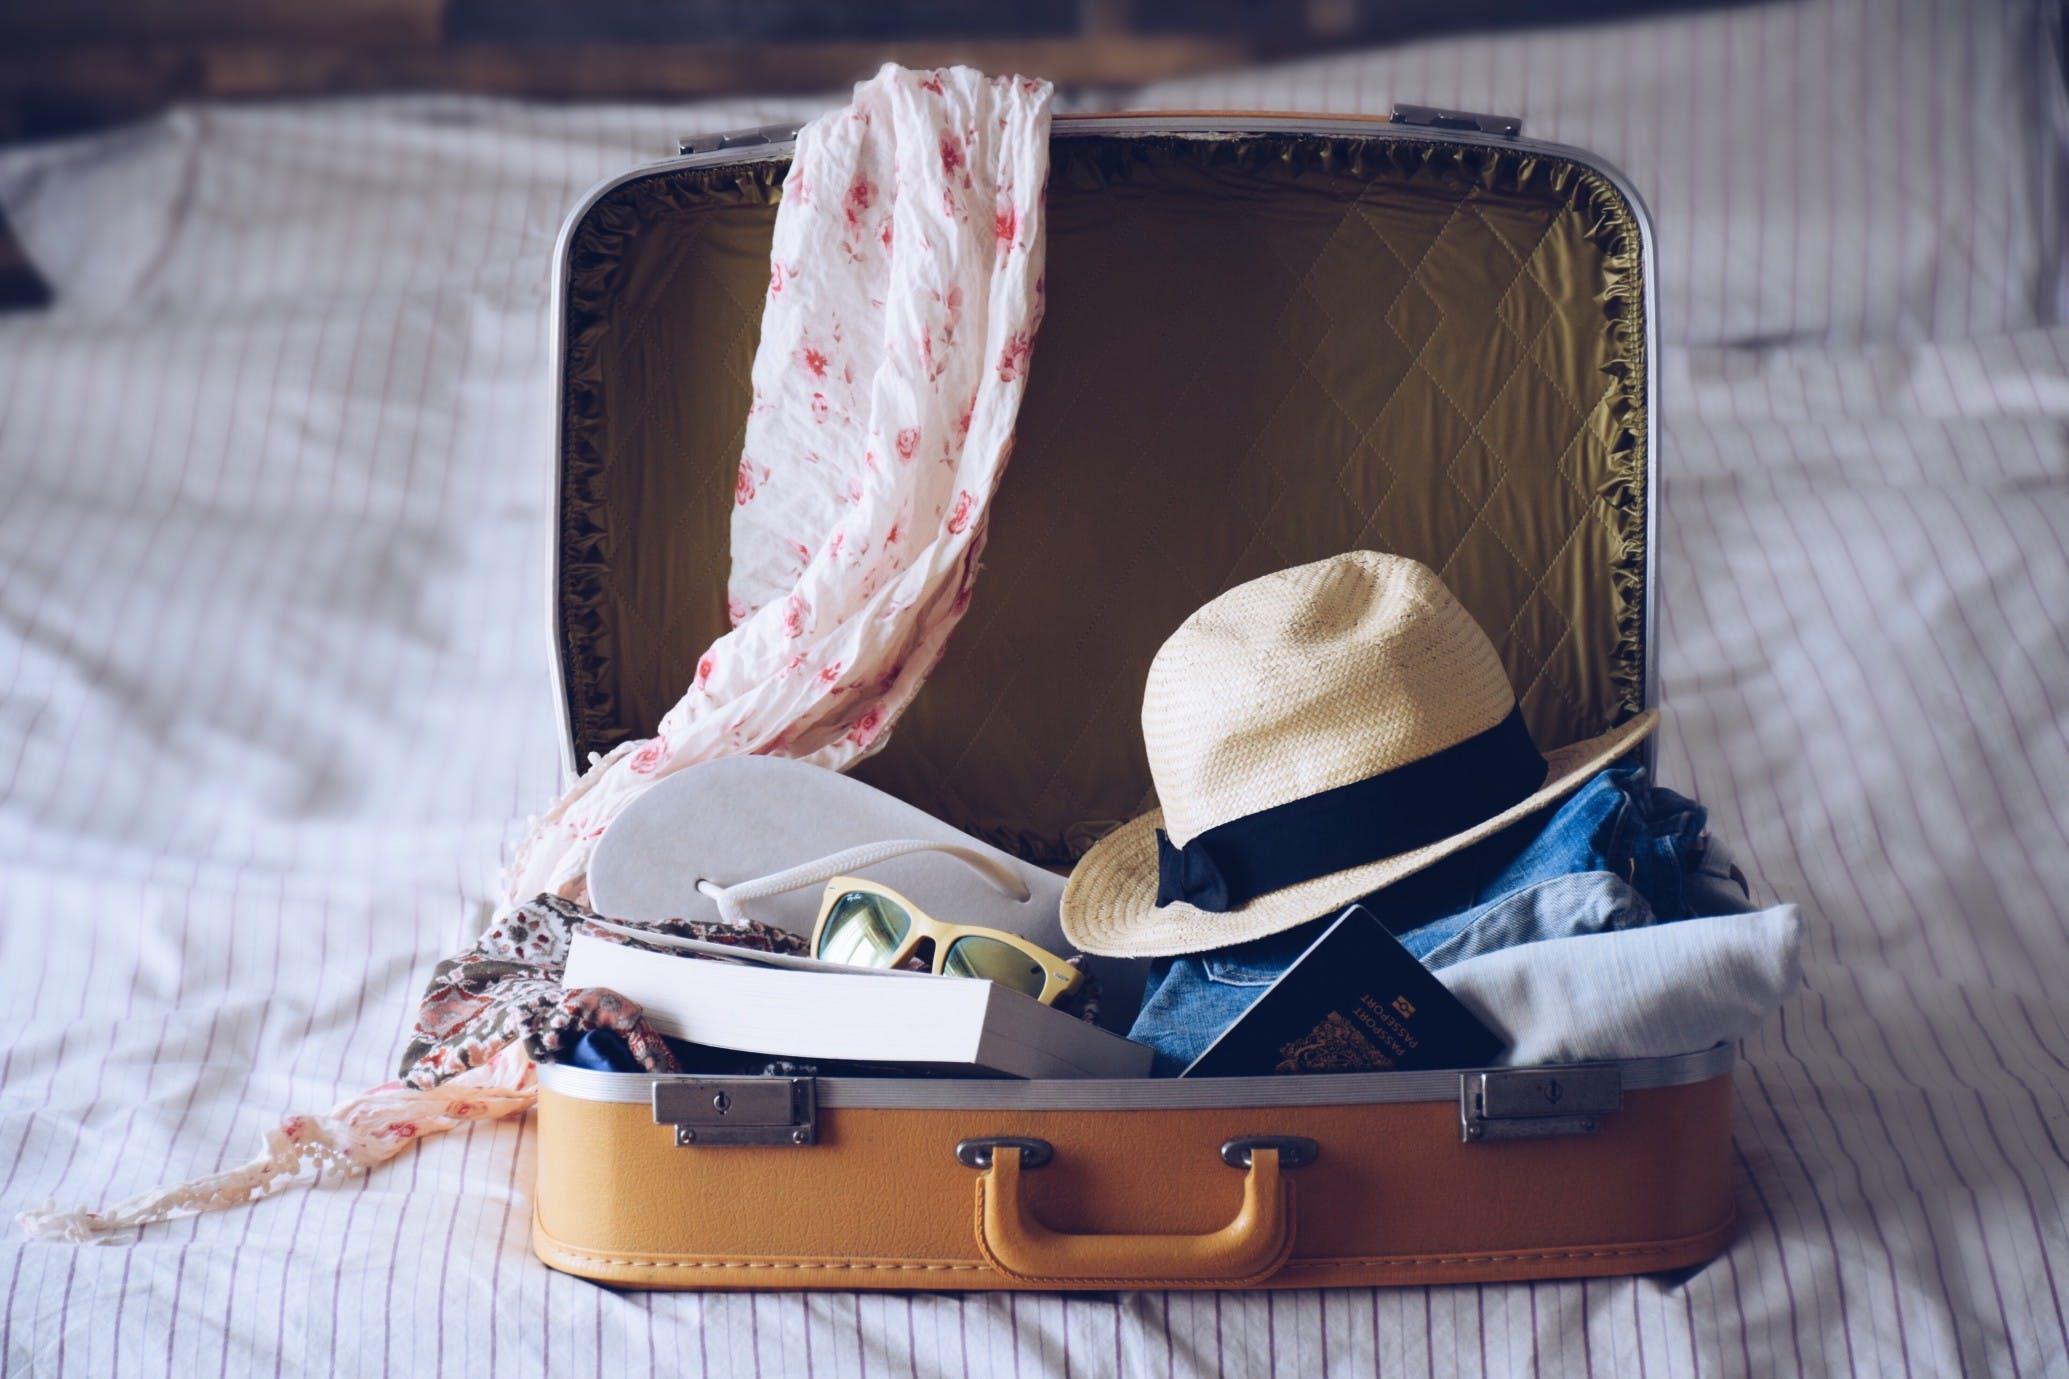 hamptons summer rental upgrades unpack